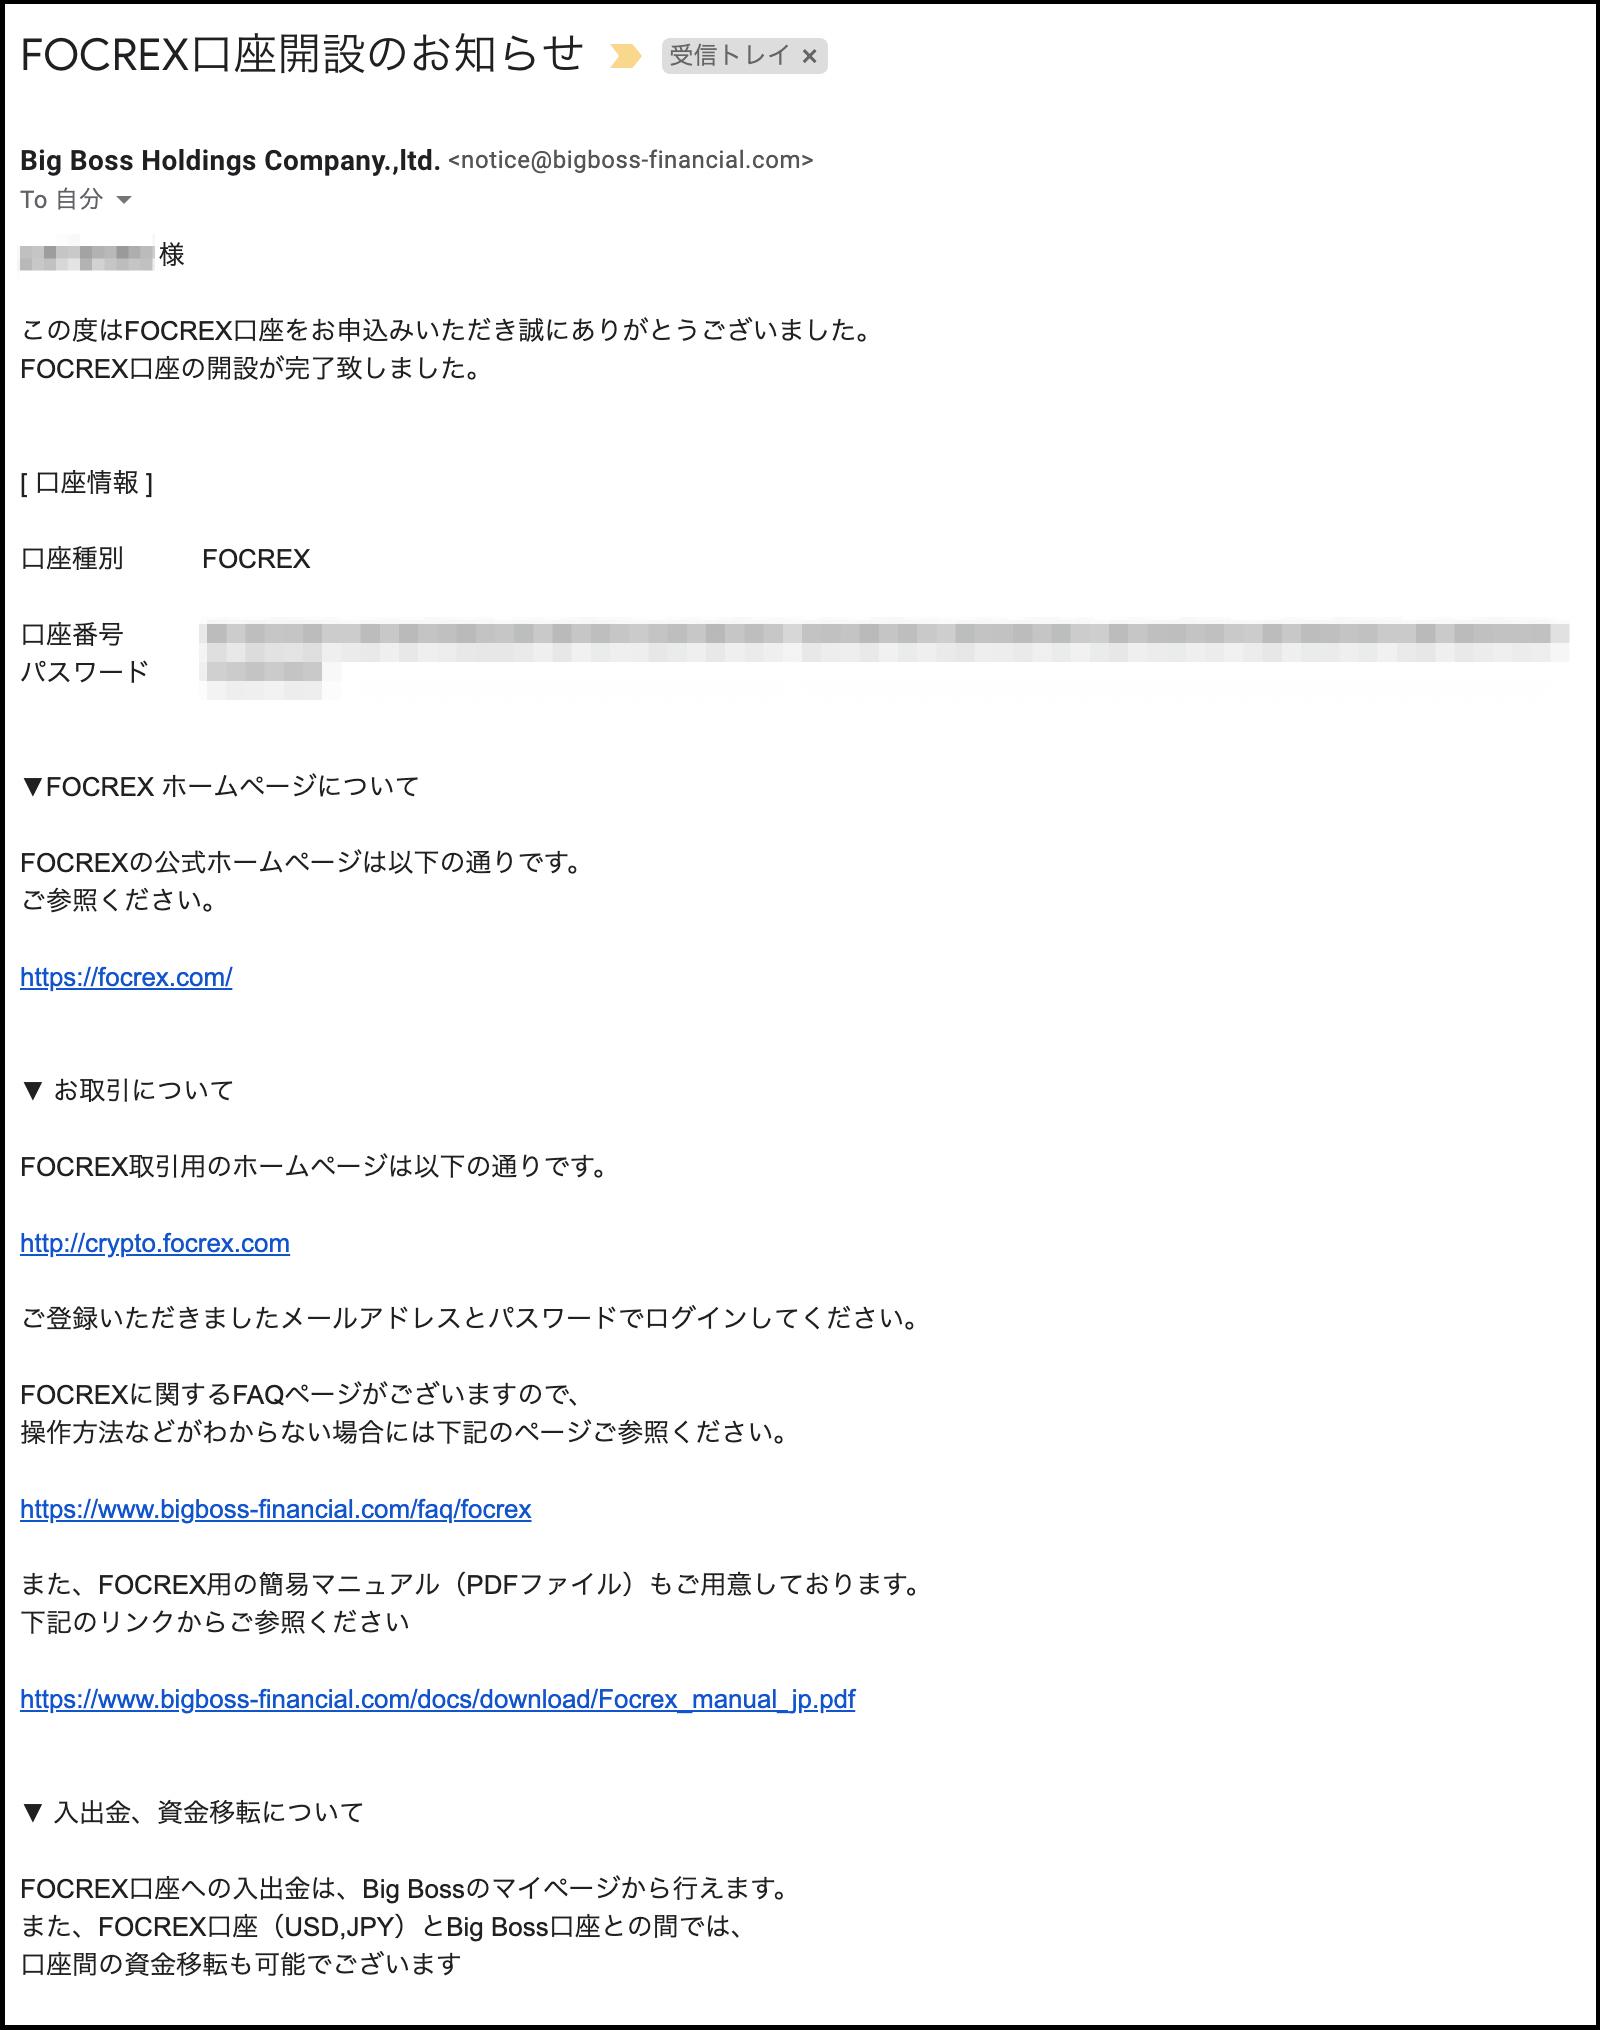 FOCREX開設完了メール